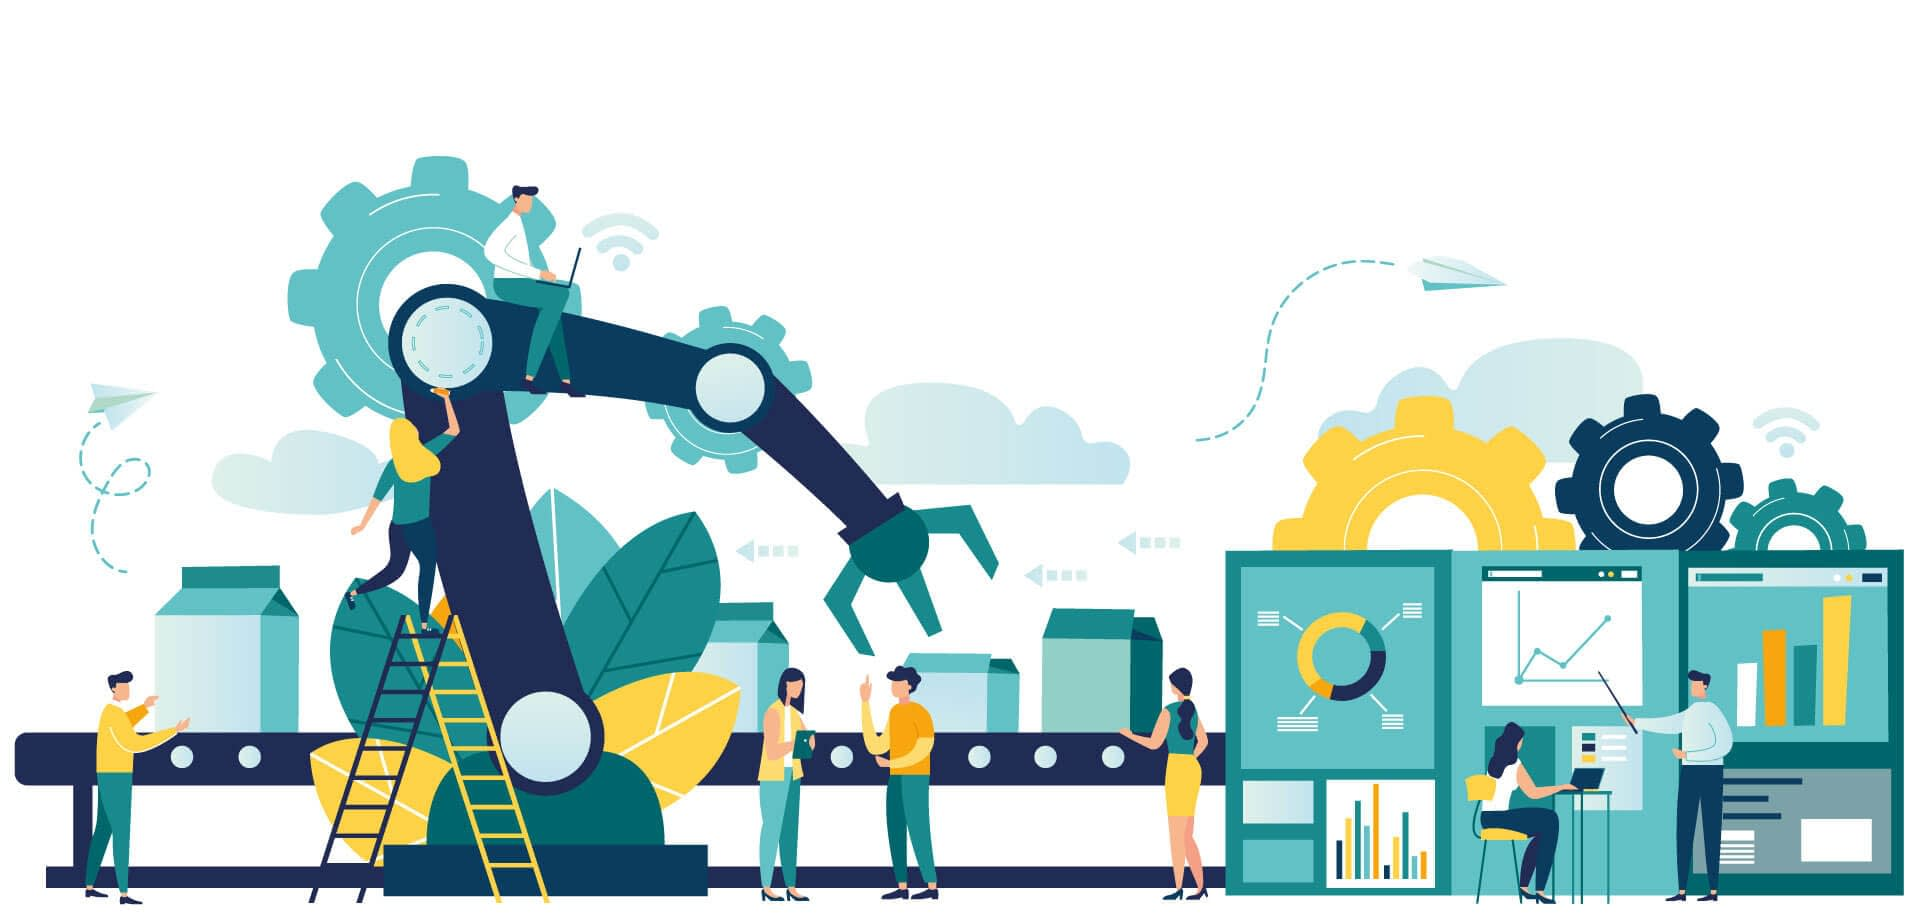 Leading Global Asset Management Company Uses Publishwise to Streamline Production of Marketing Content